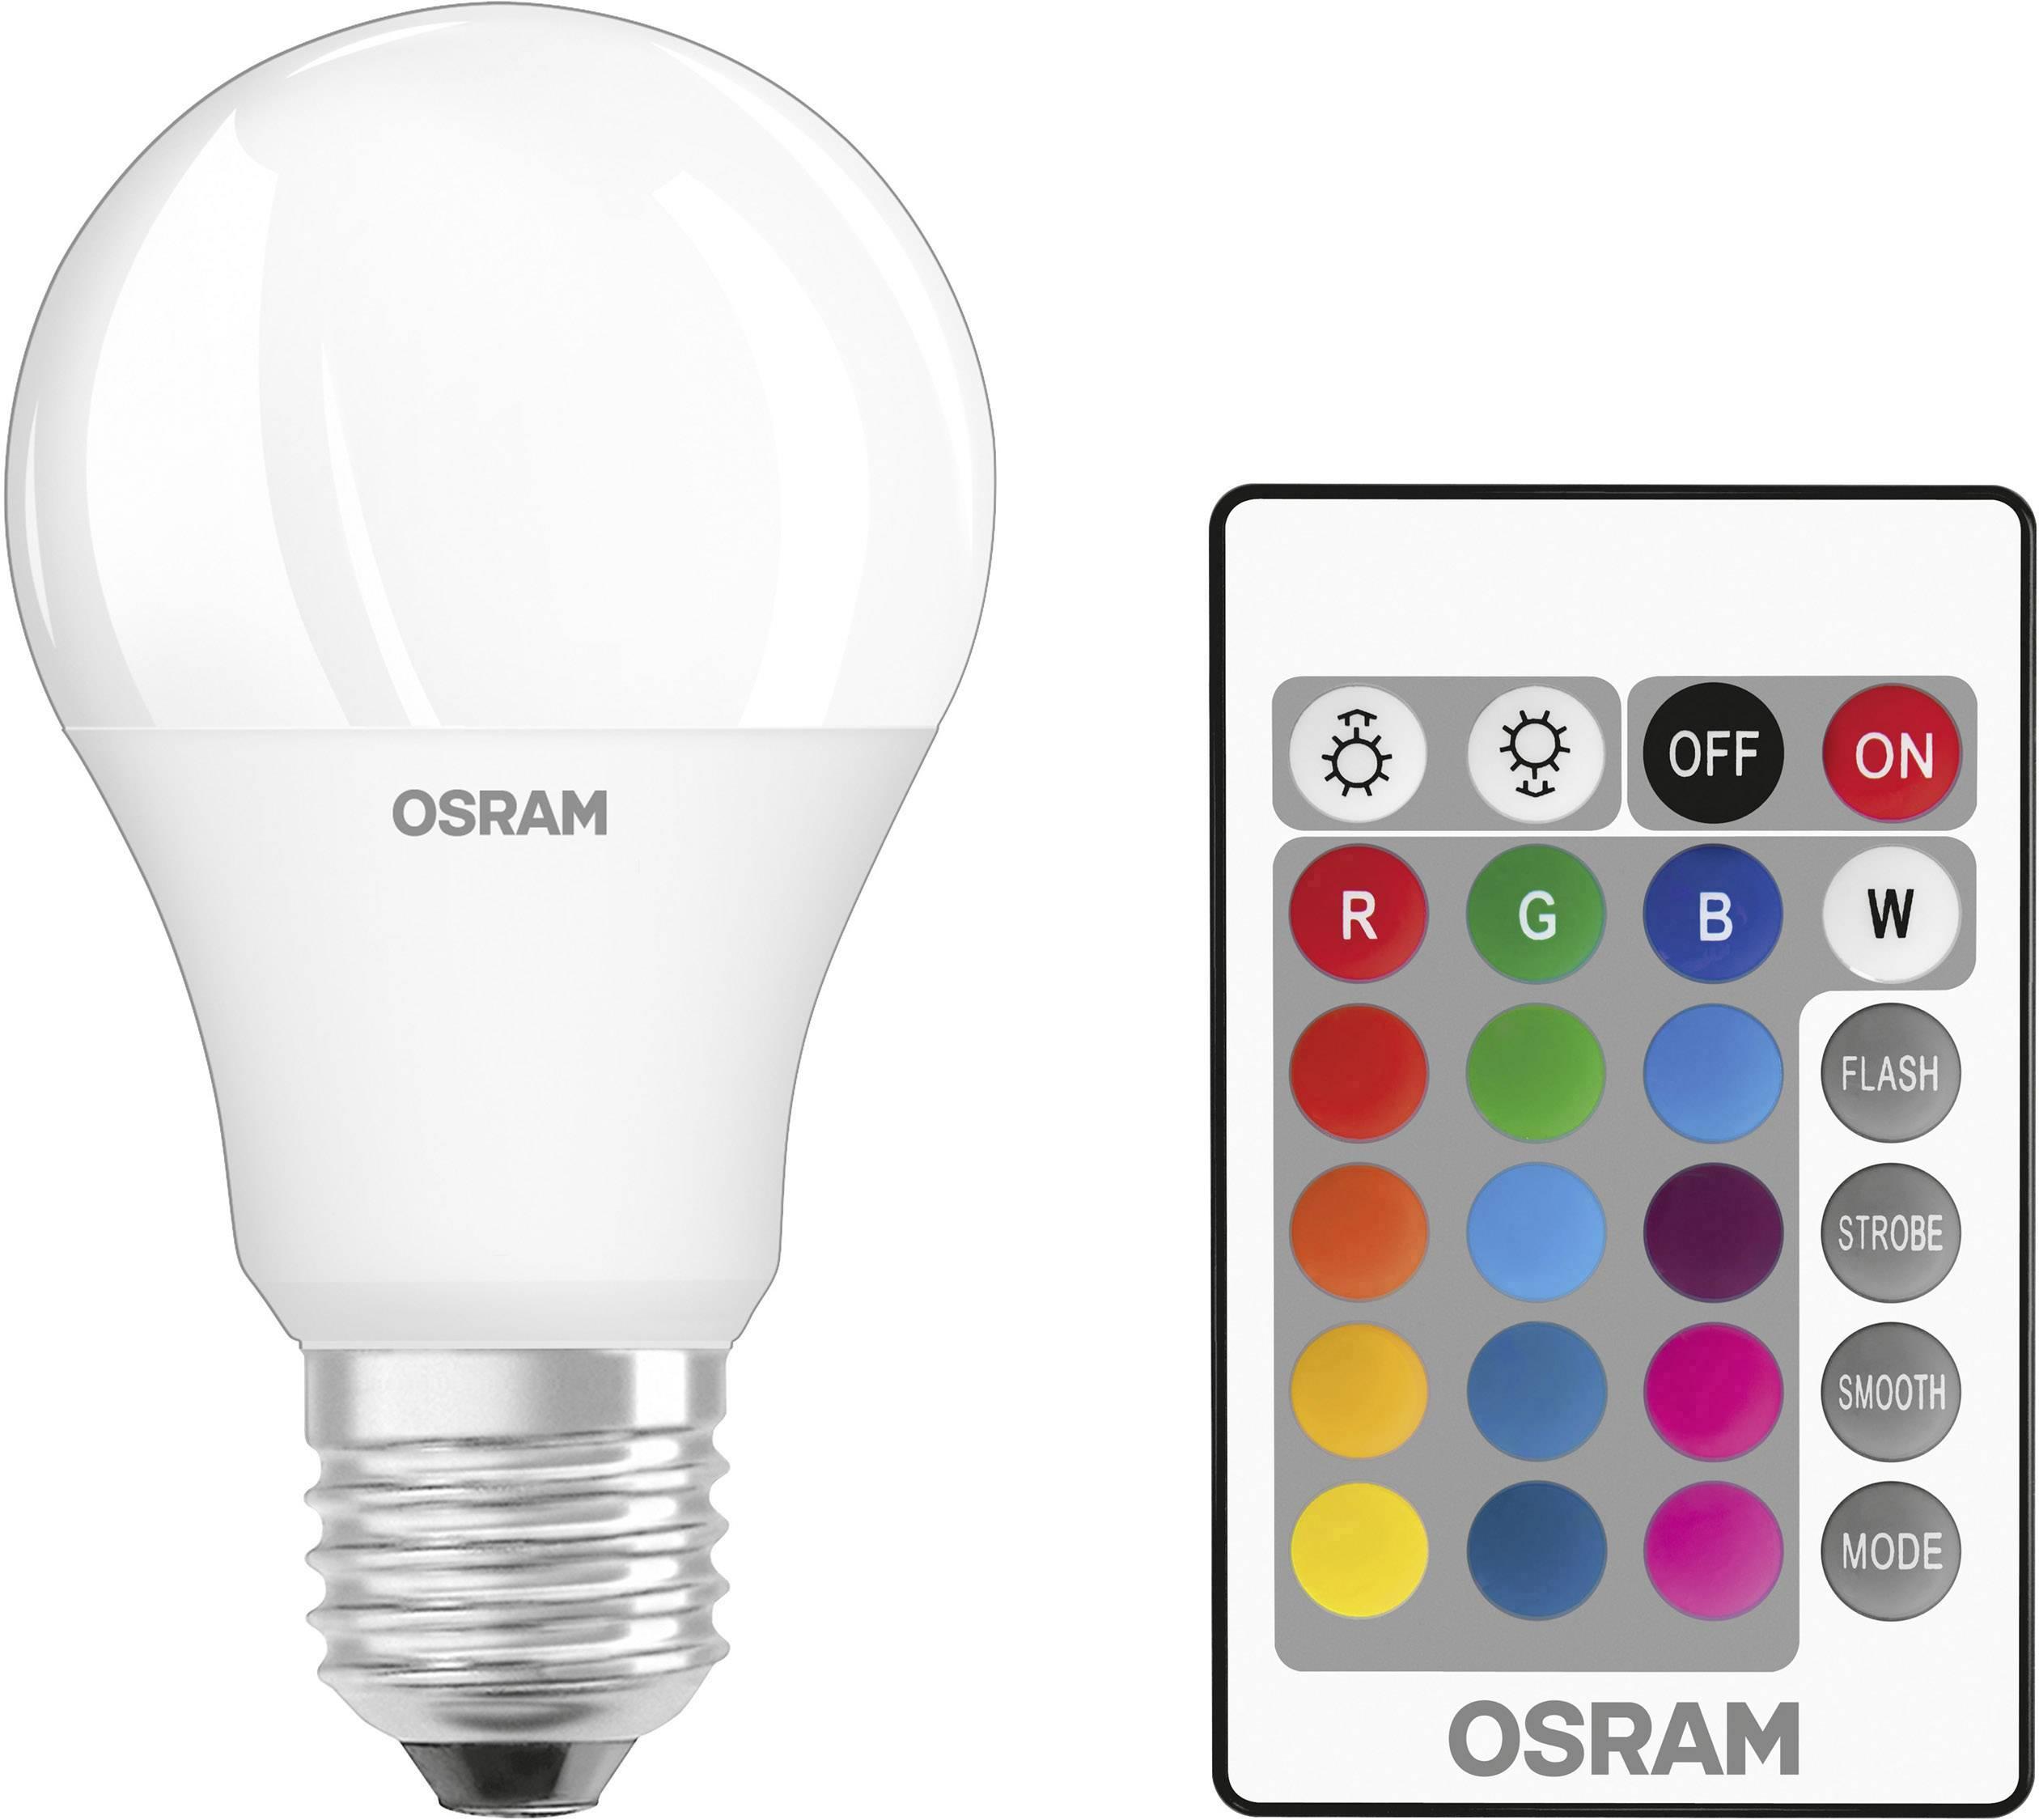 Uberlegen OSRAM LED EEK A+ (A++   E) E27 Glühlampenform 9 W U003d 60 W